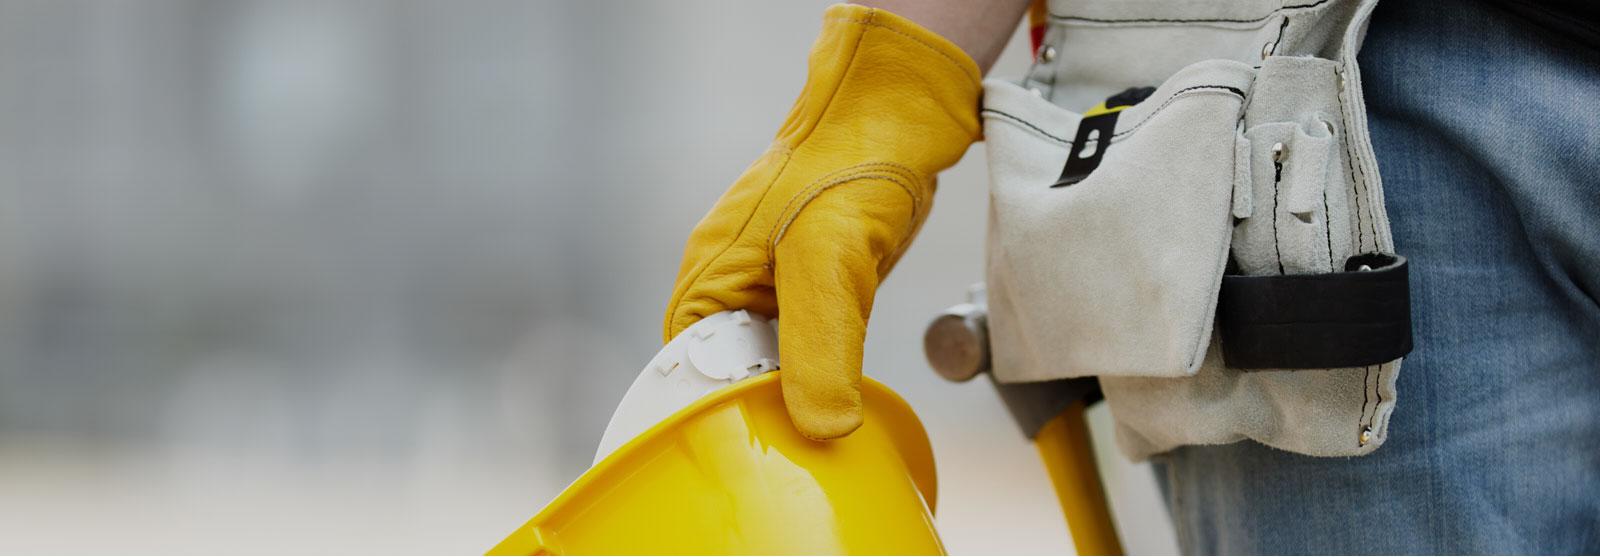 abc handyman and restoration